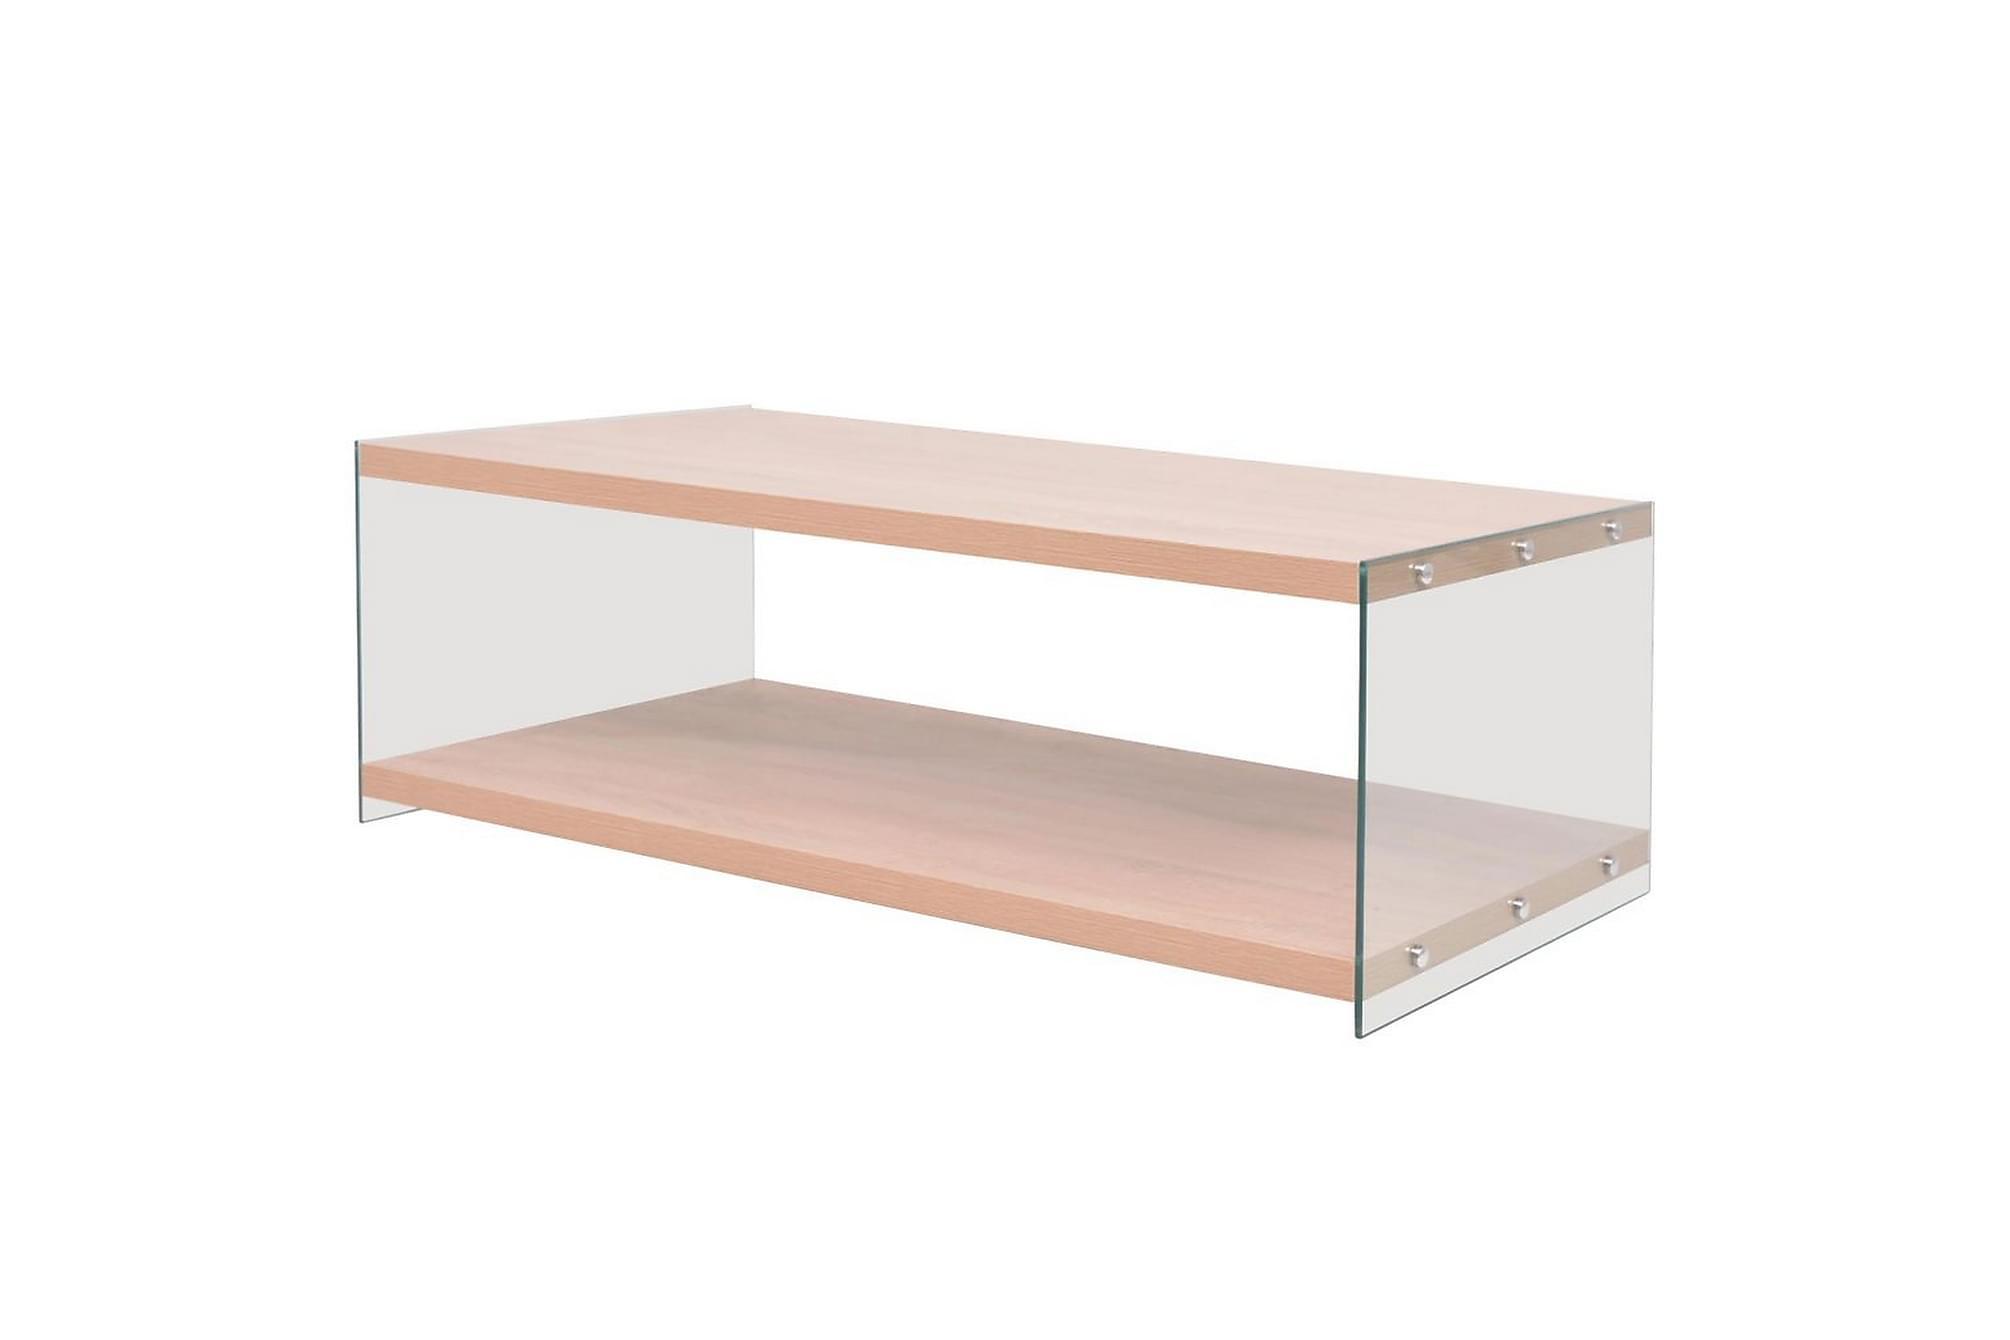 Soffbord med hylla glas MDF ekfärgad